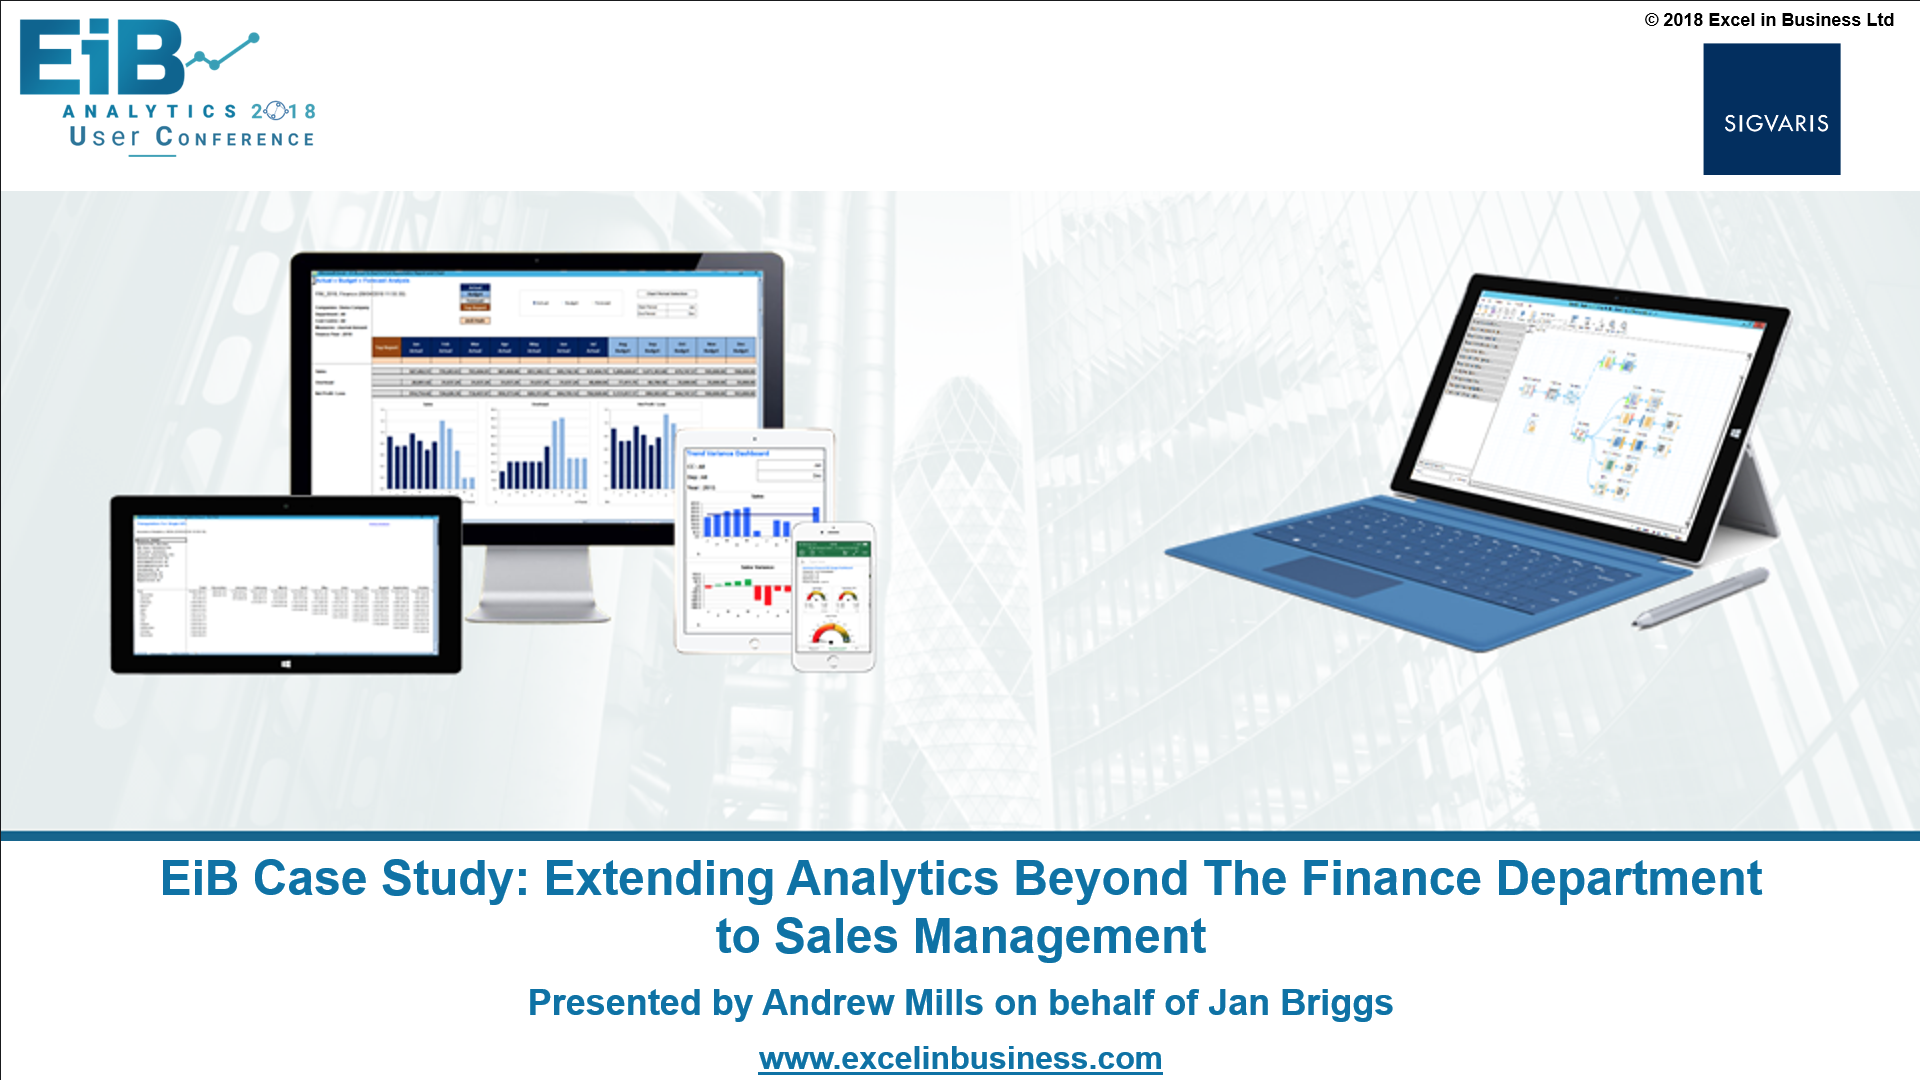 4.4 - Finance Stream - Extending Analytics Beyond the Finance Department to Sales Management - Jan Briggs